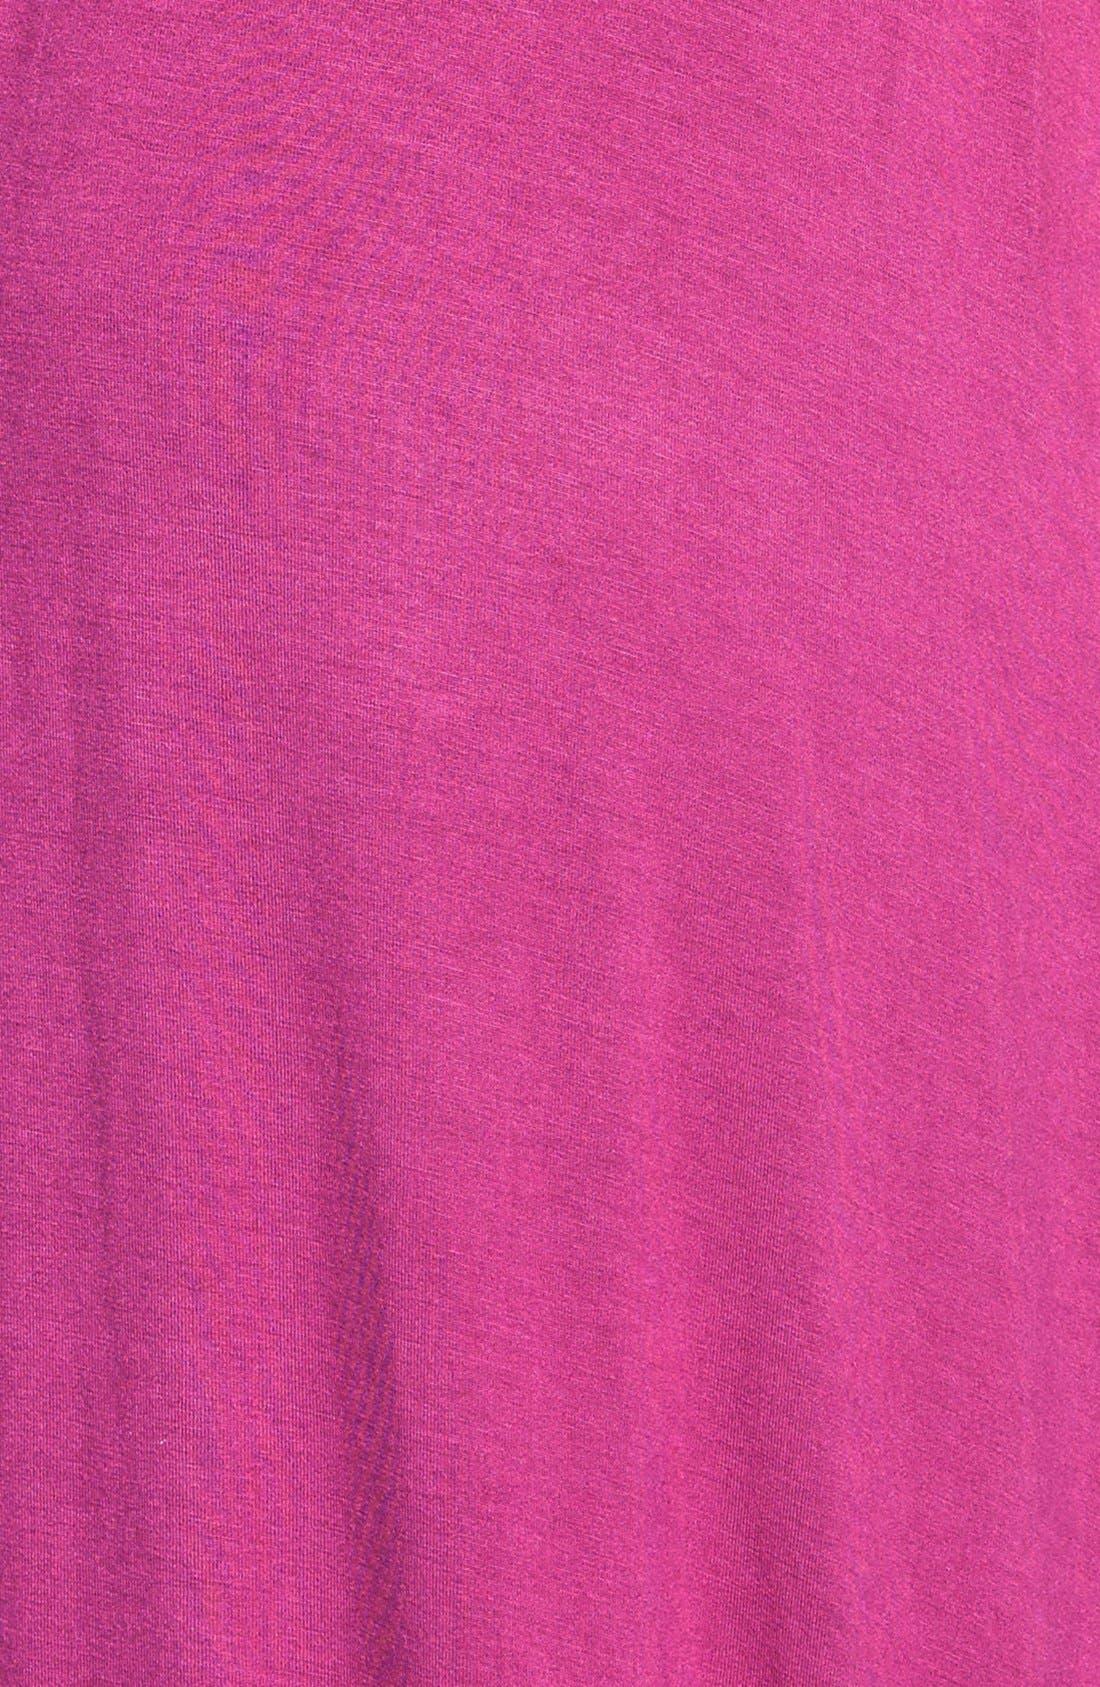 Alternate Image 3  - Halogen® Blouson Dress with Asymmetrical Hem (Regular & Petite)